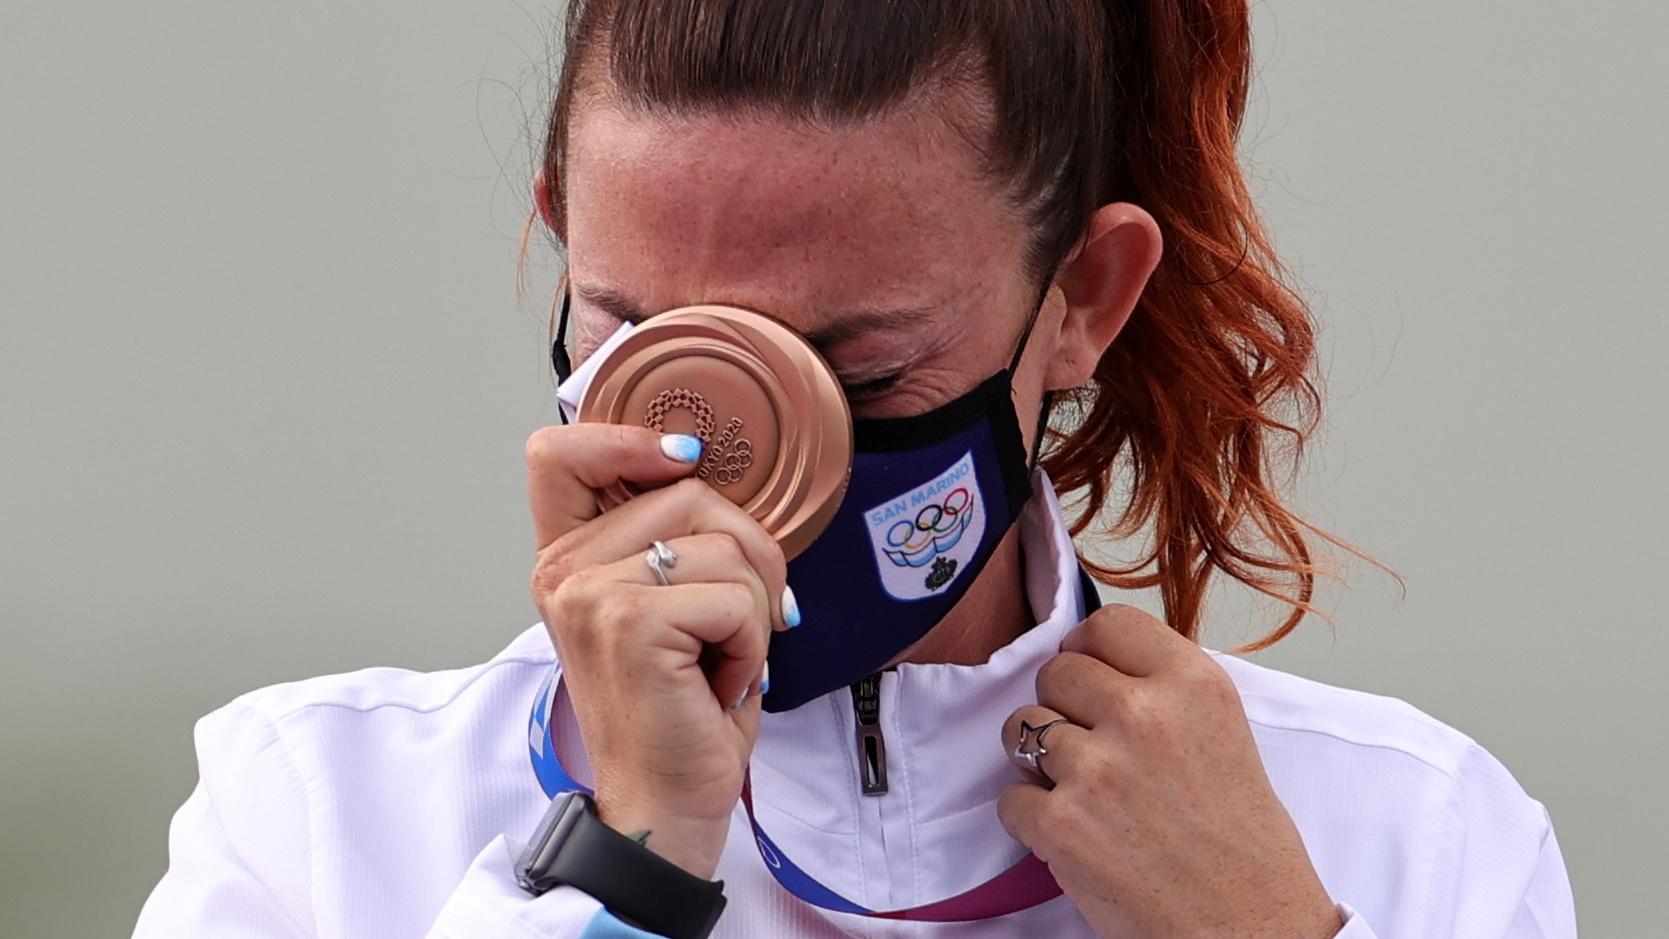 Tokyo 2020 Olympics - Shooting - Women's Trap - Medal Ceremony - Asaka Shooting Range, Tokyo, Japan - July 29, 2021. Bronze medalist Alessandra Perilli of San Marino reacts REUTERS/Ann Wang